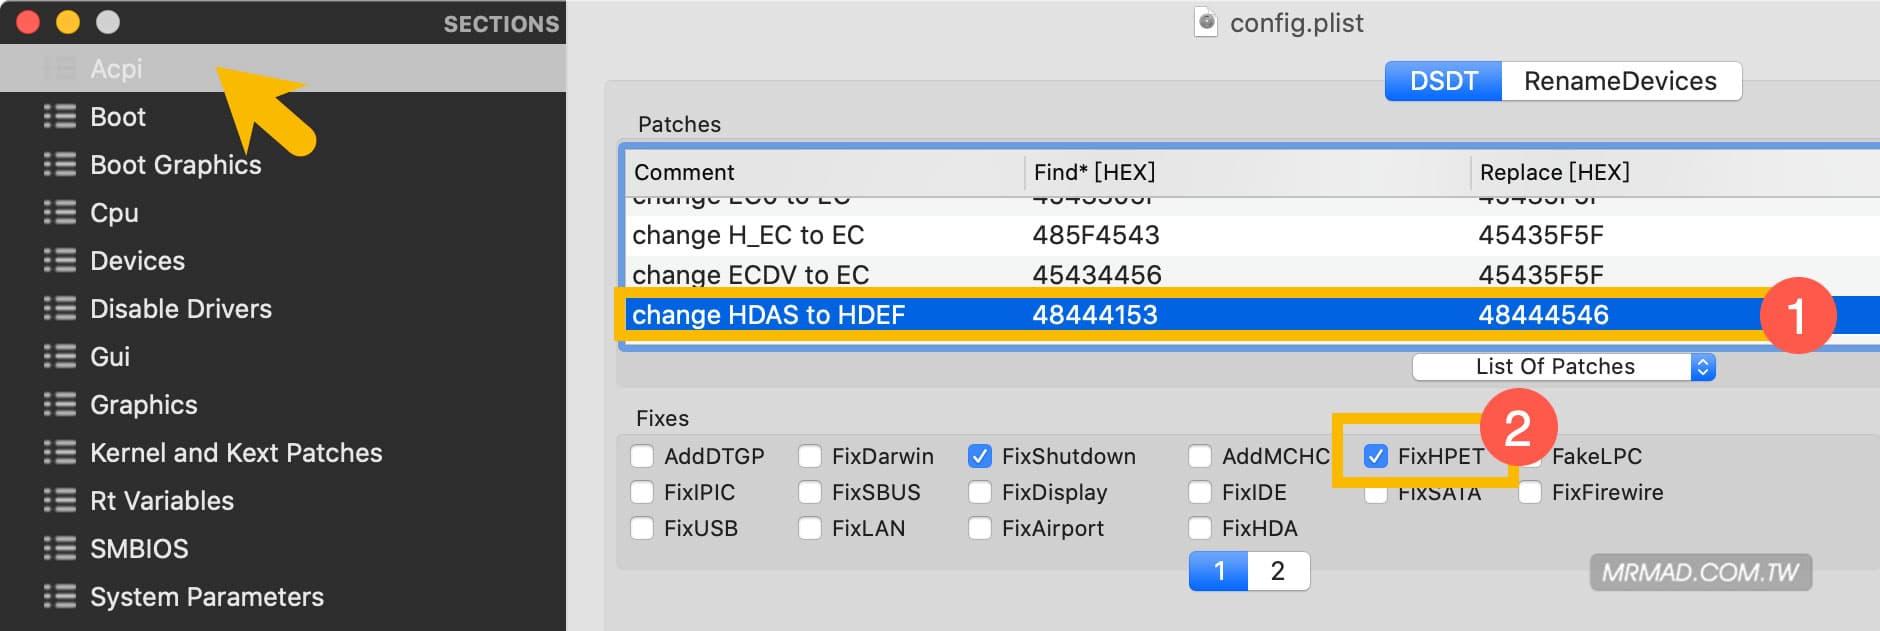 macOS 黑蘋果 AppleALC 仿音效驅動實現原生 AppleHDA 方式